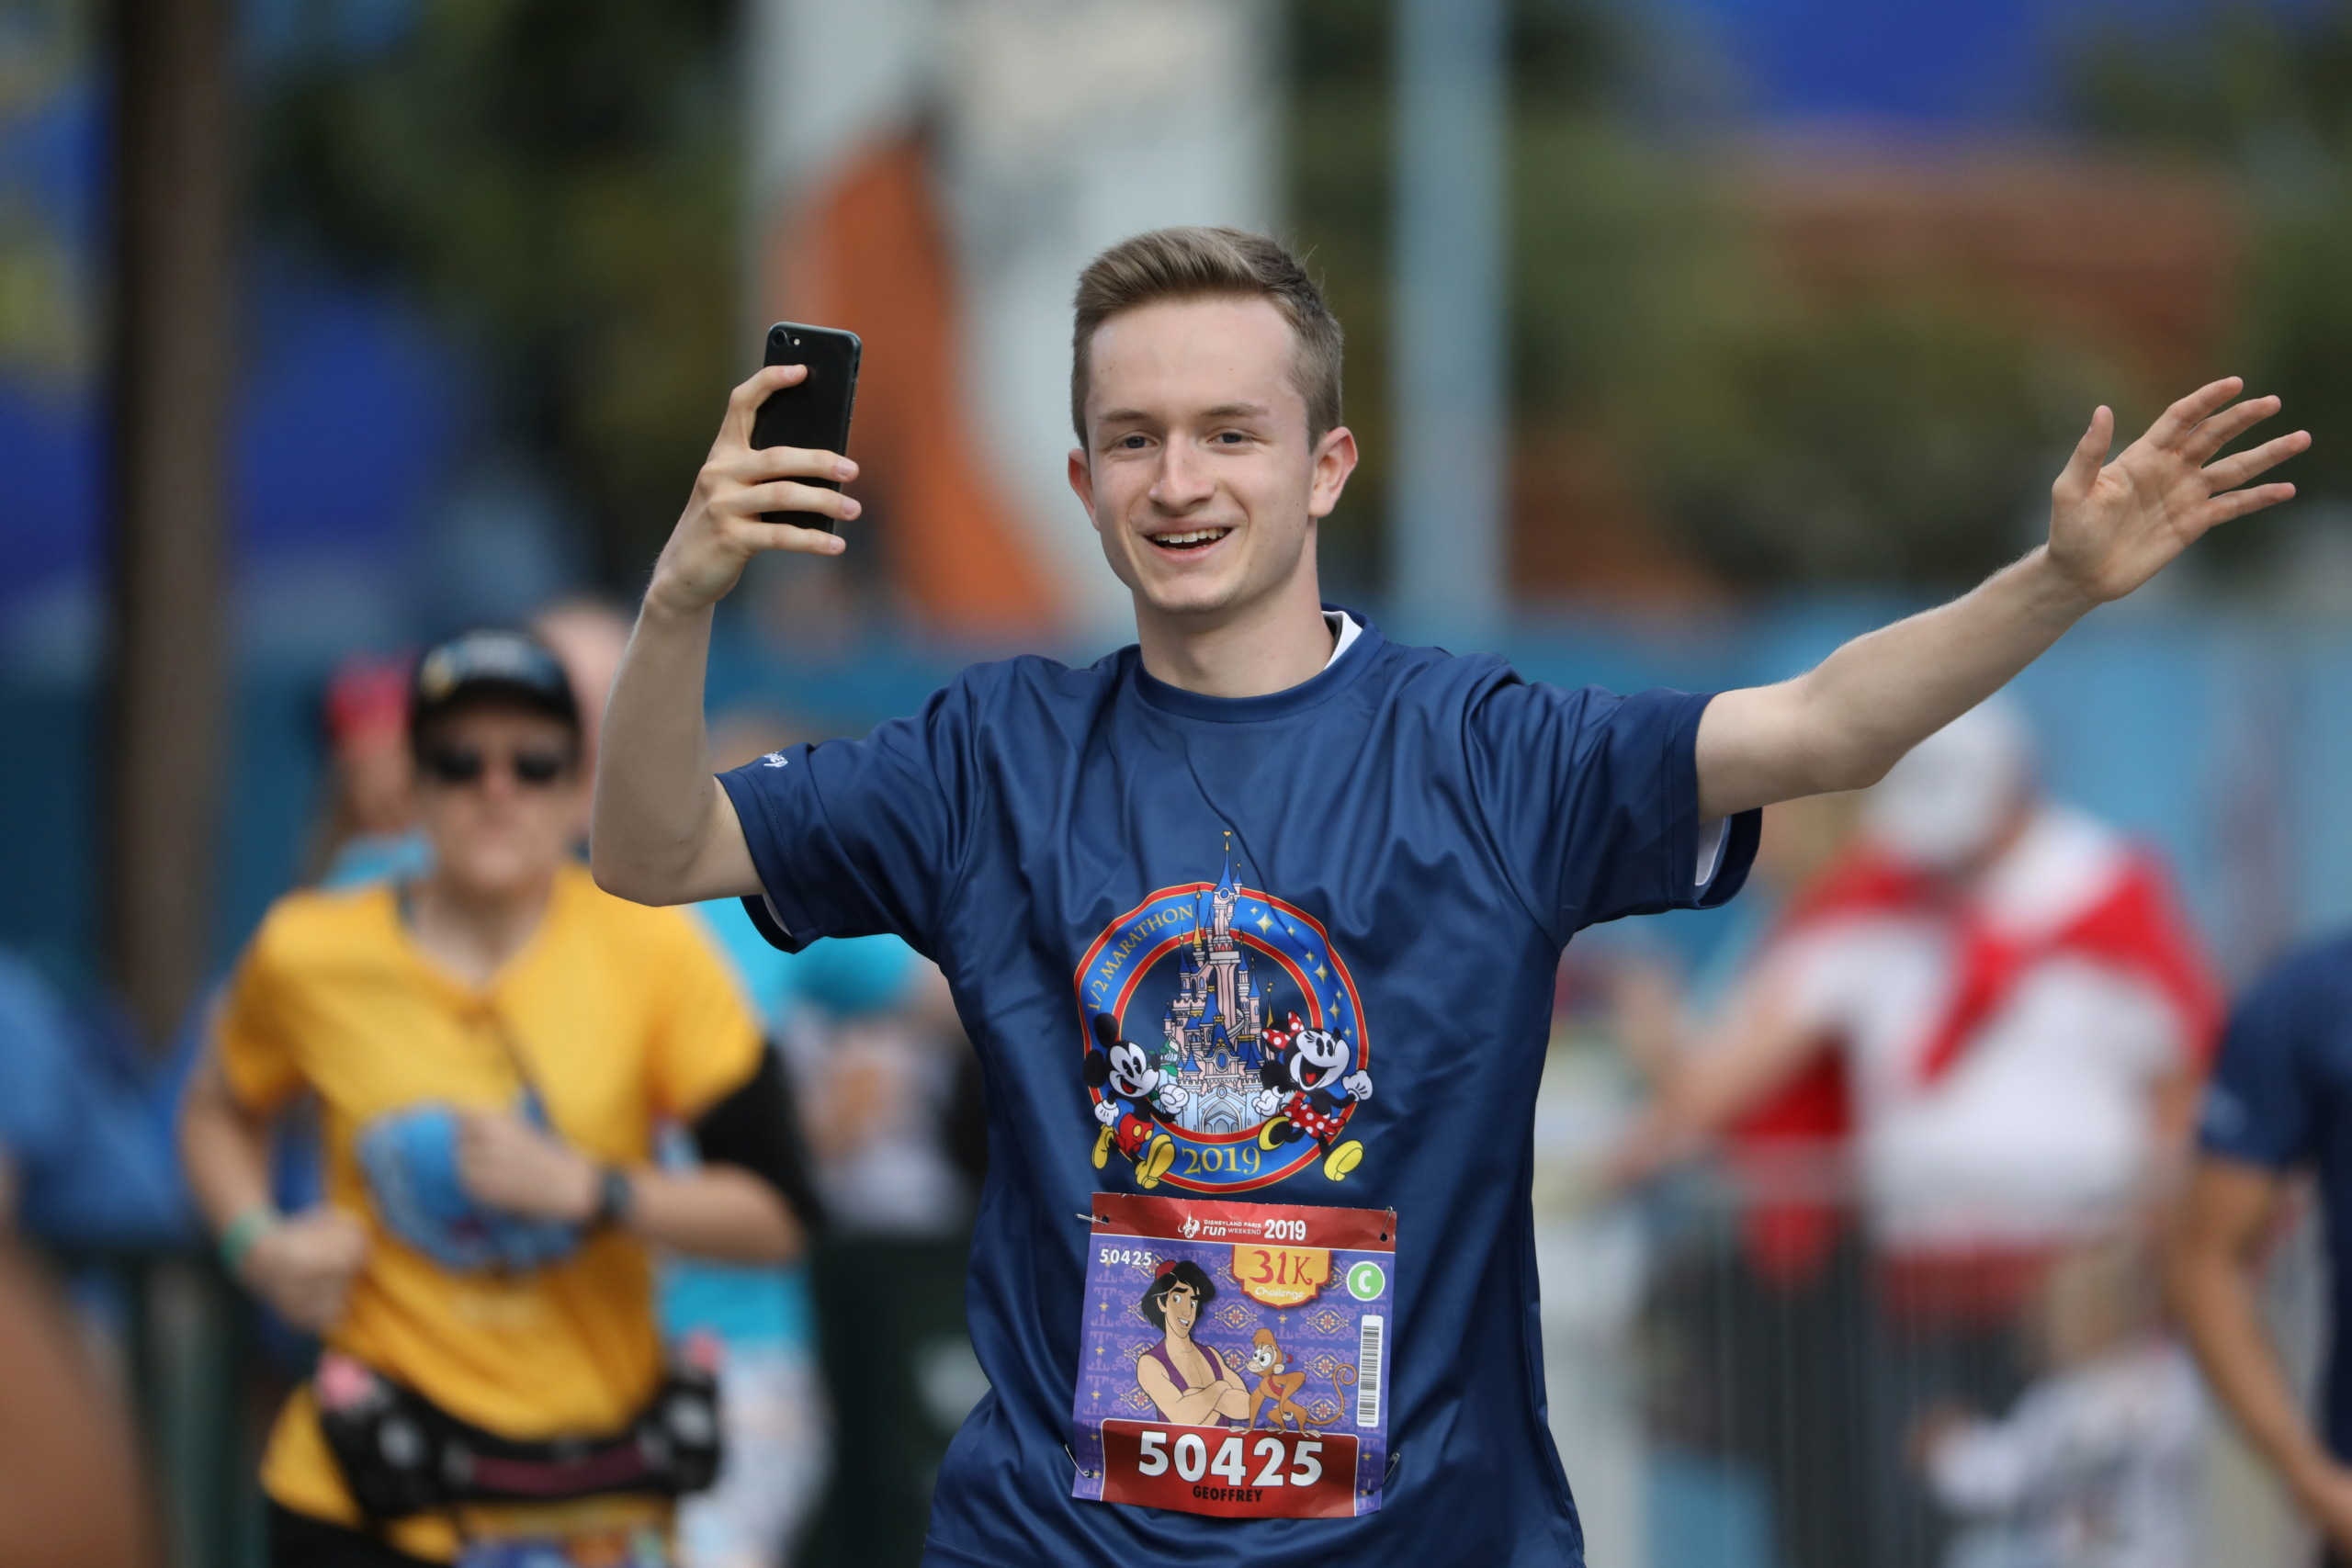 2019 - Disneyland Paris Run Weekend - Pagina 3 21k_1510